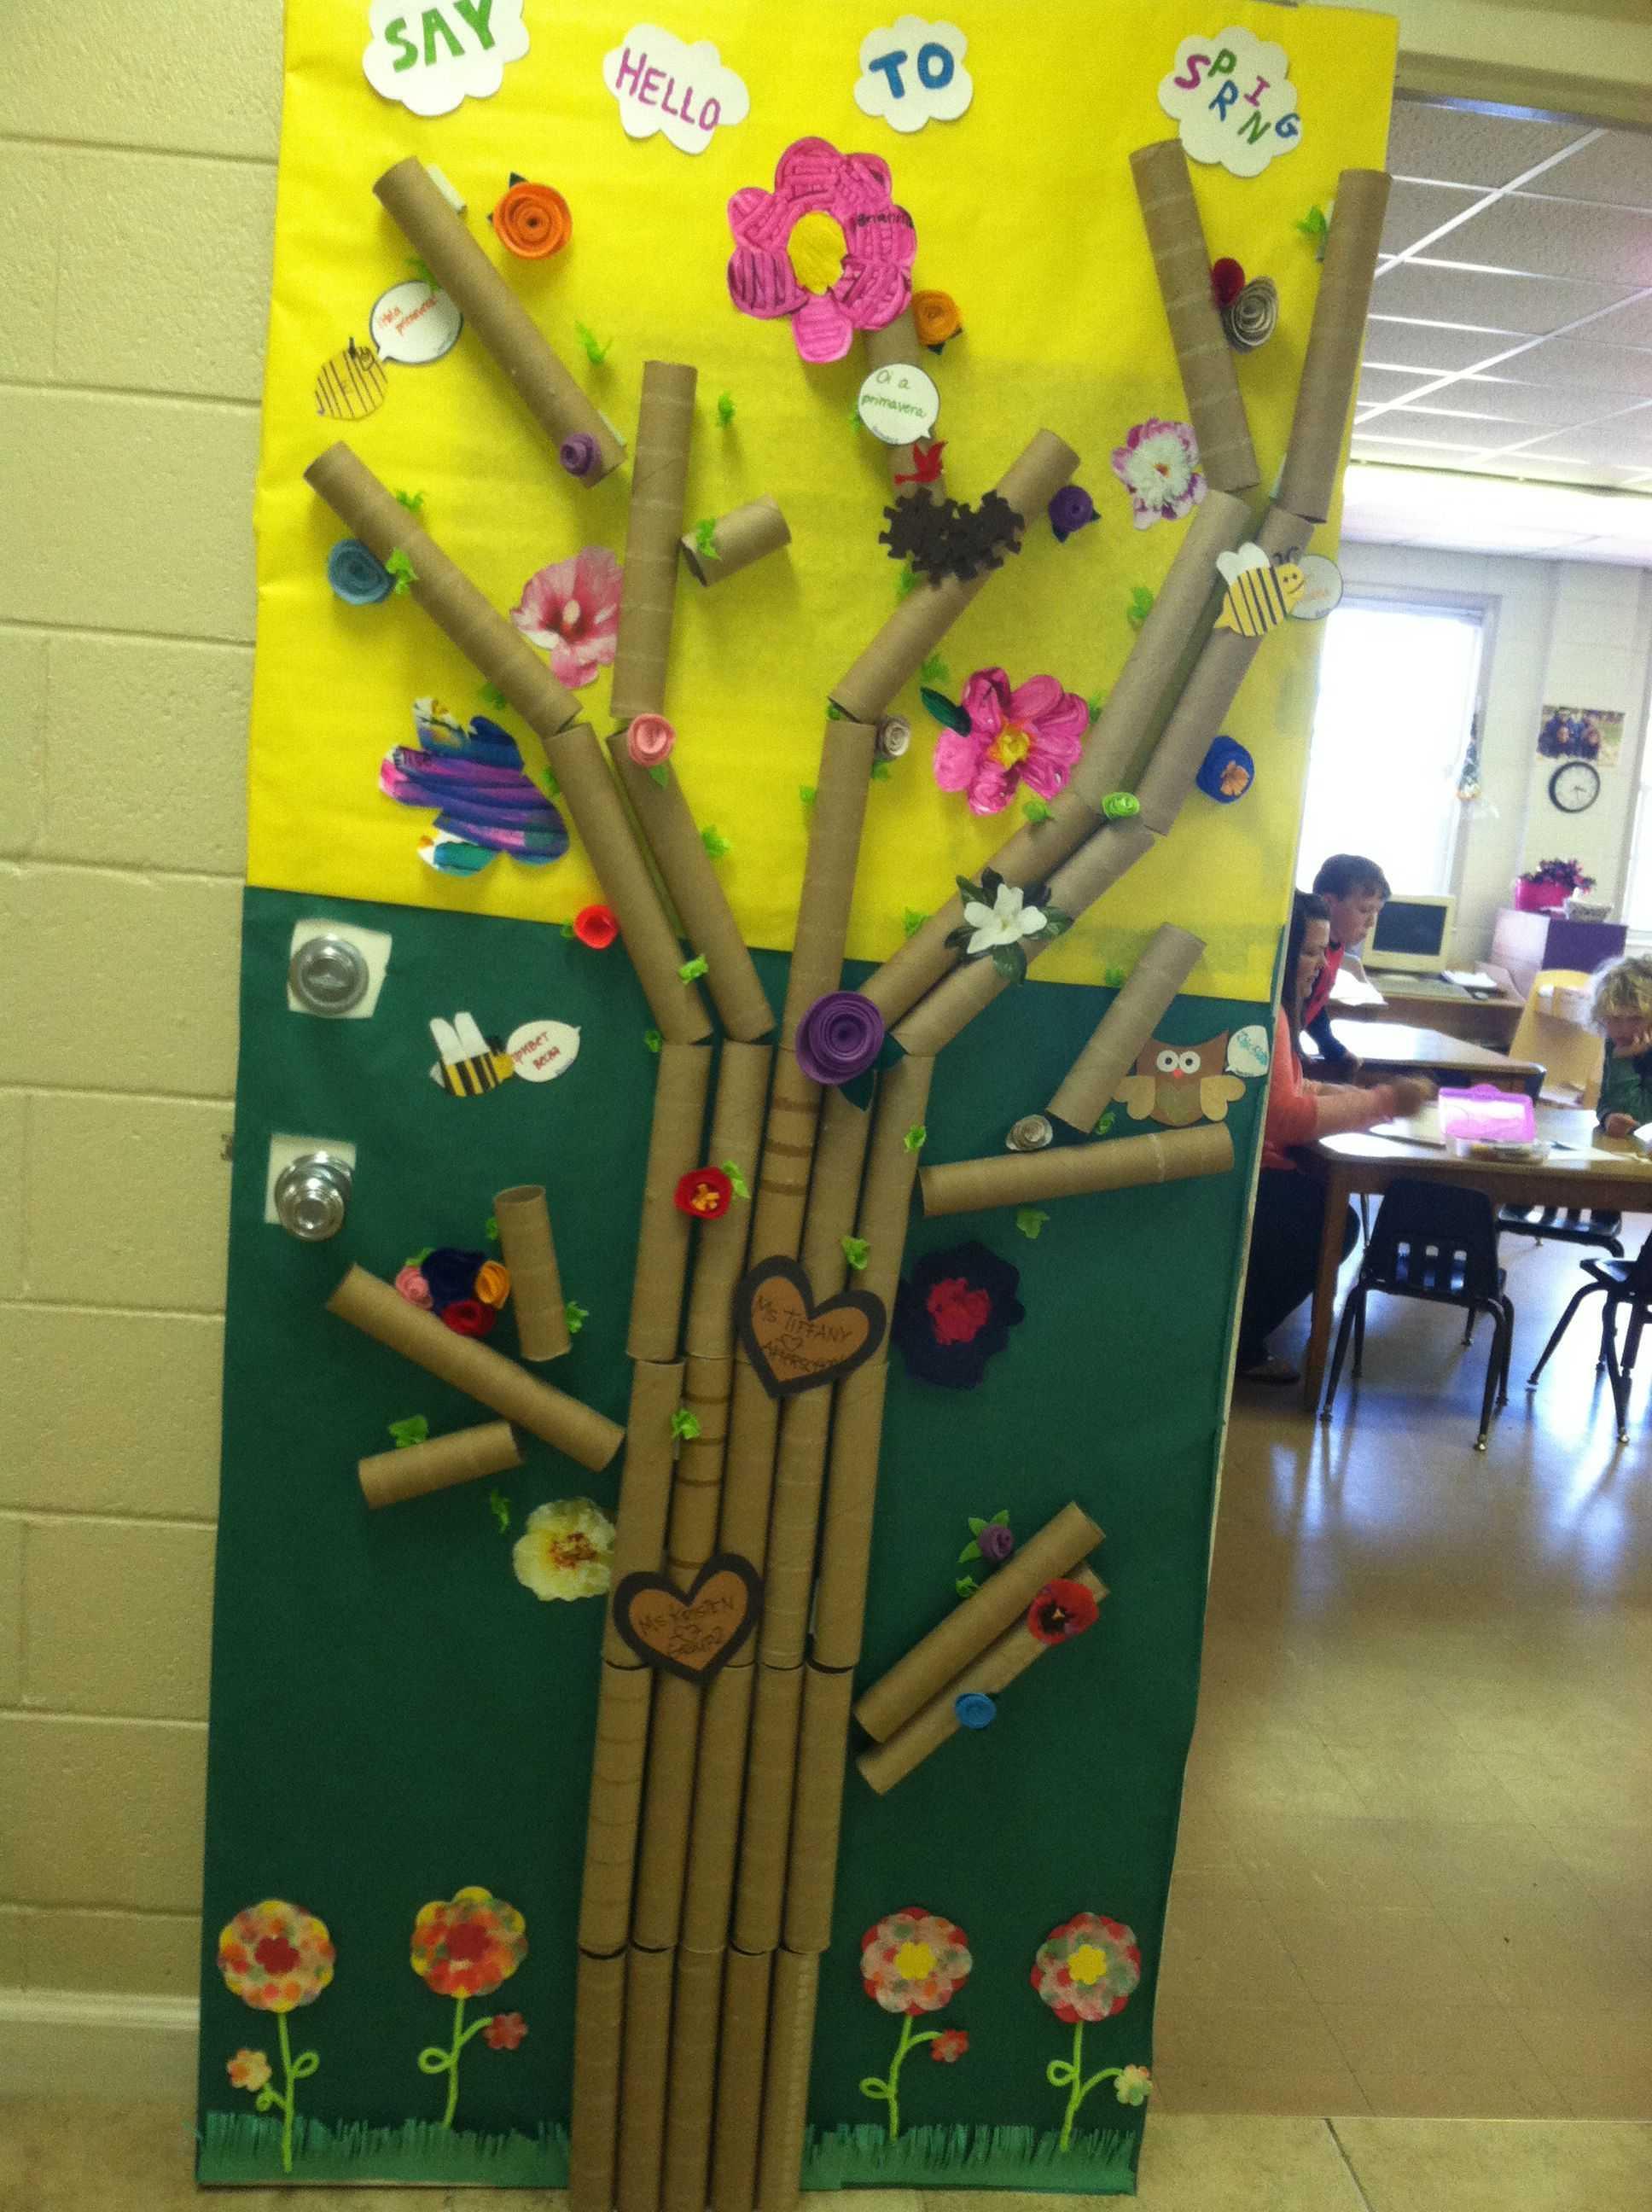 Realism And Fantasy Worksheets For Kindergarten And